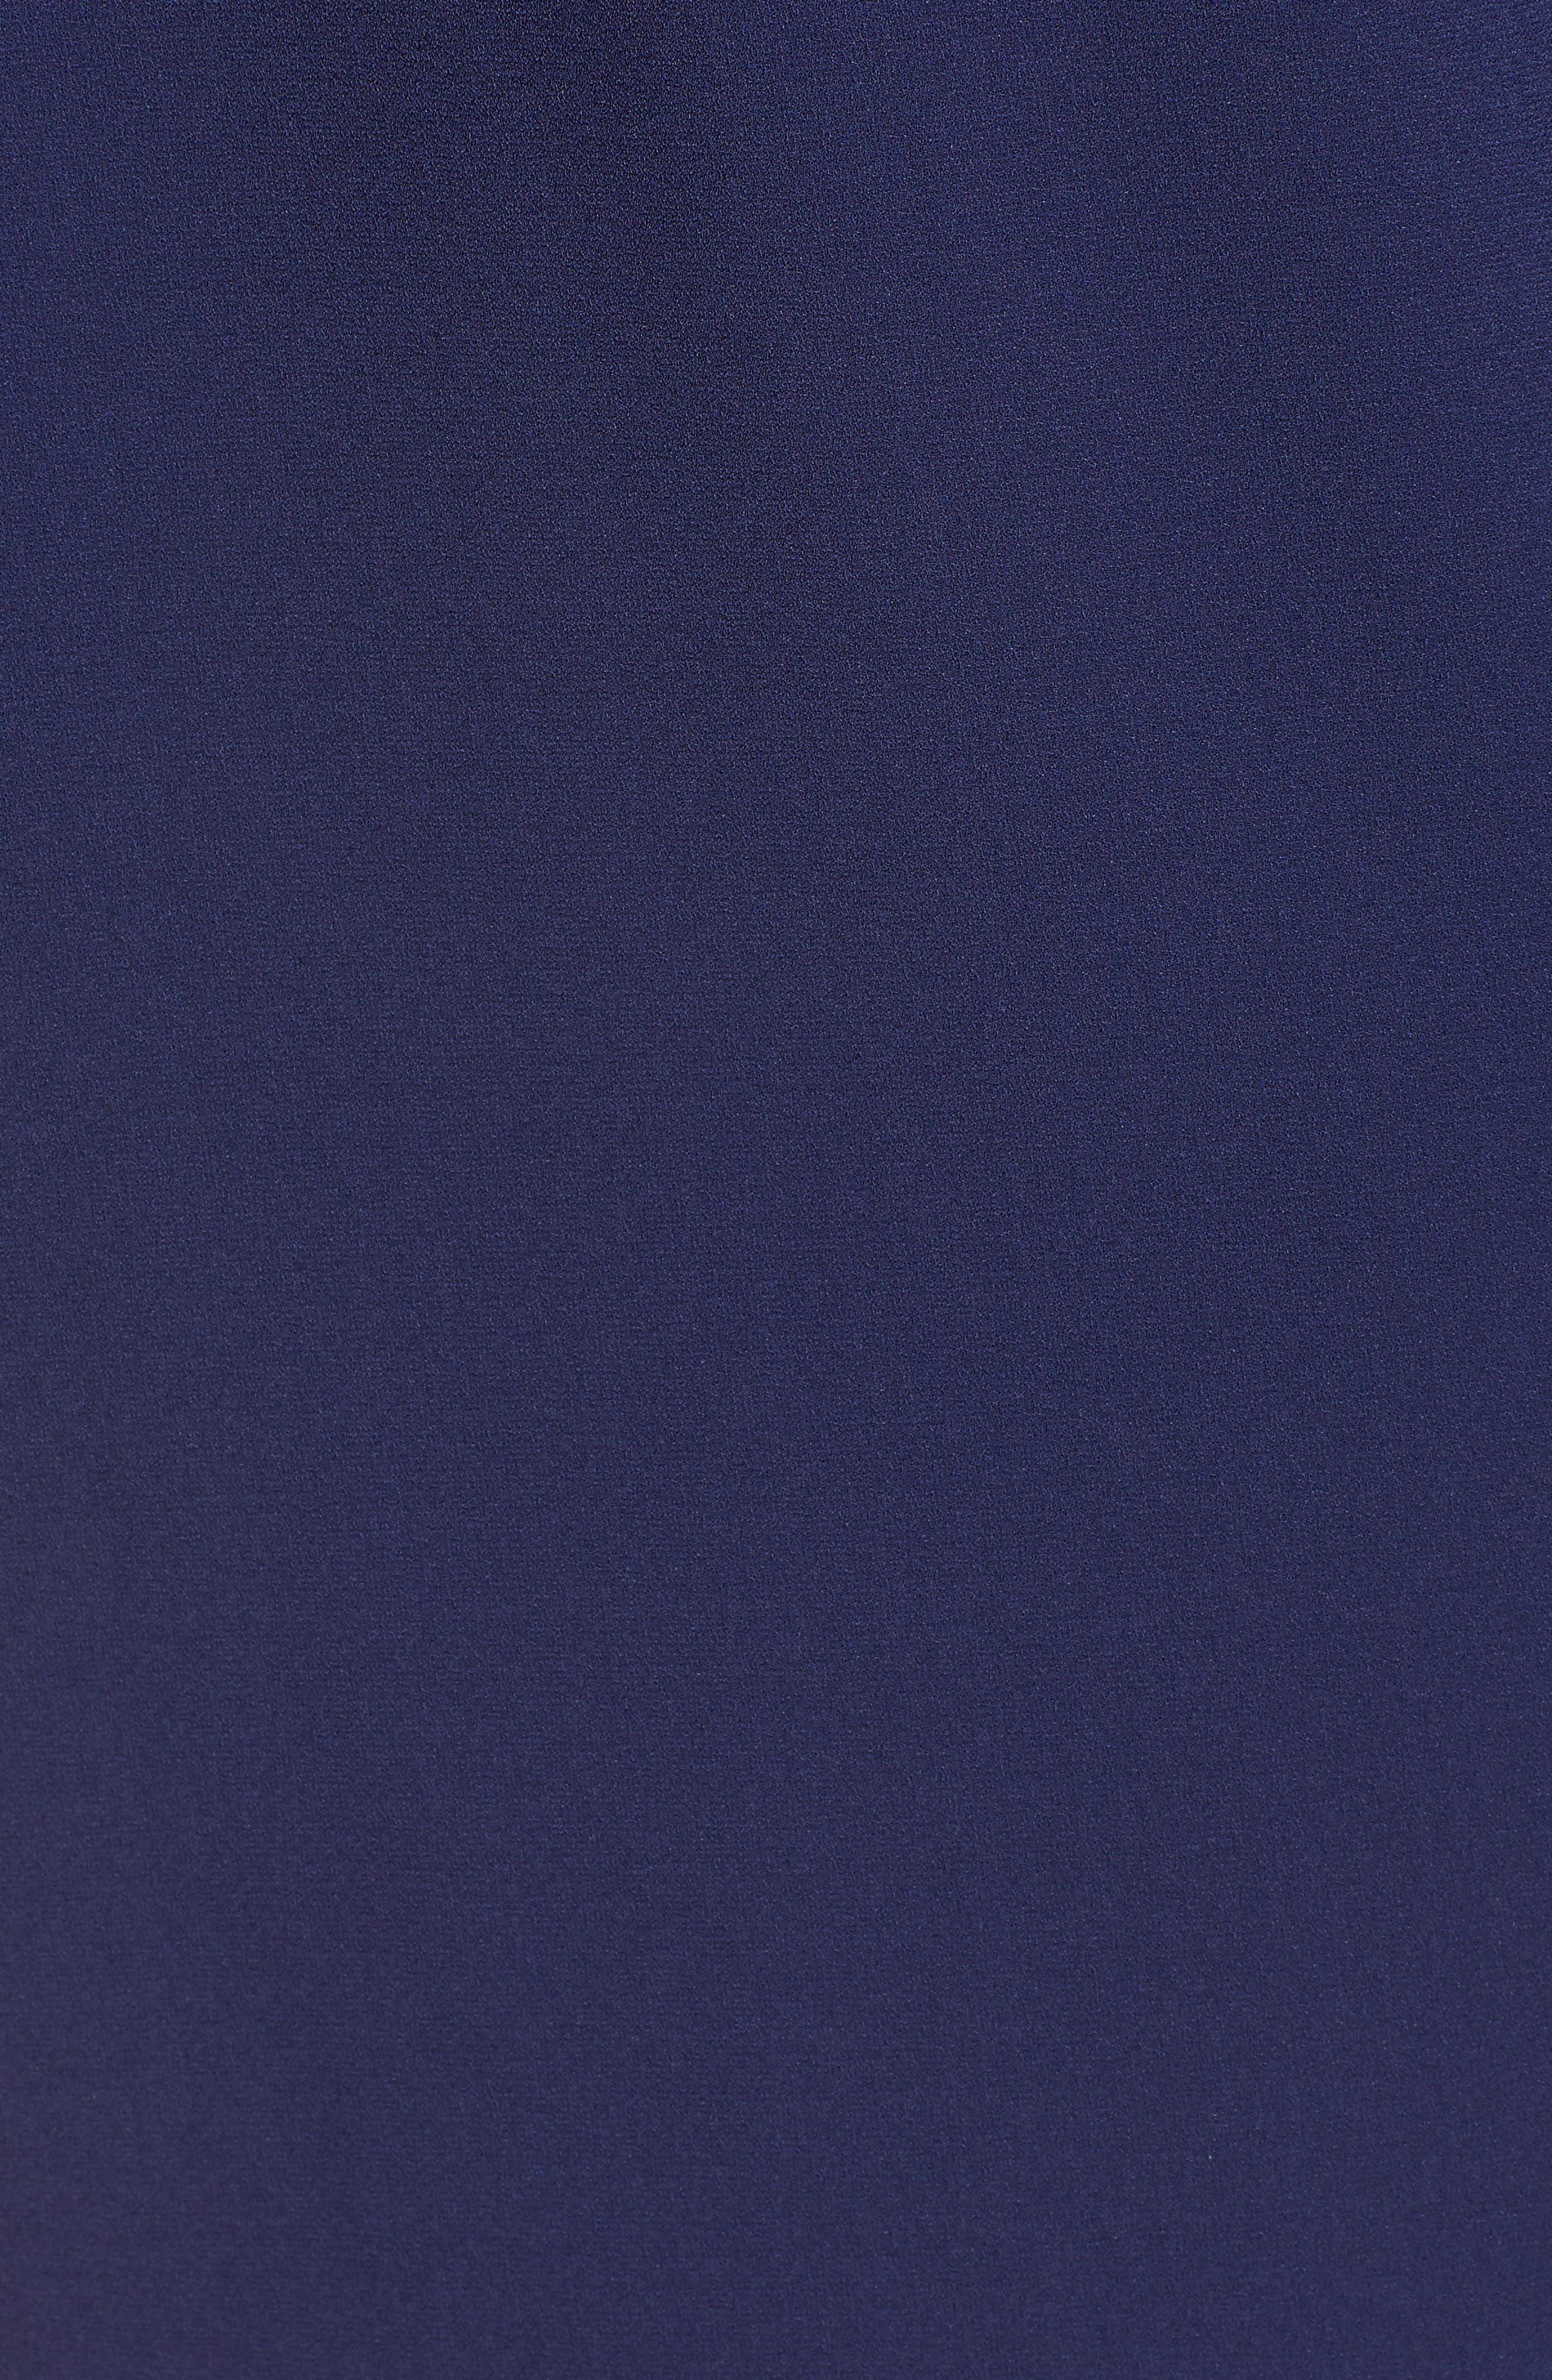 Bow Back Flare Sleeve Dress,                             Alternate thumbnail 6, color,                             410